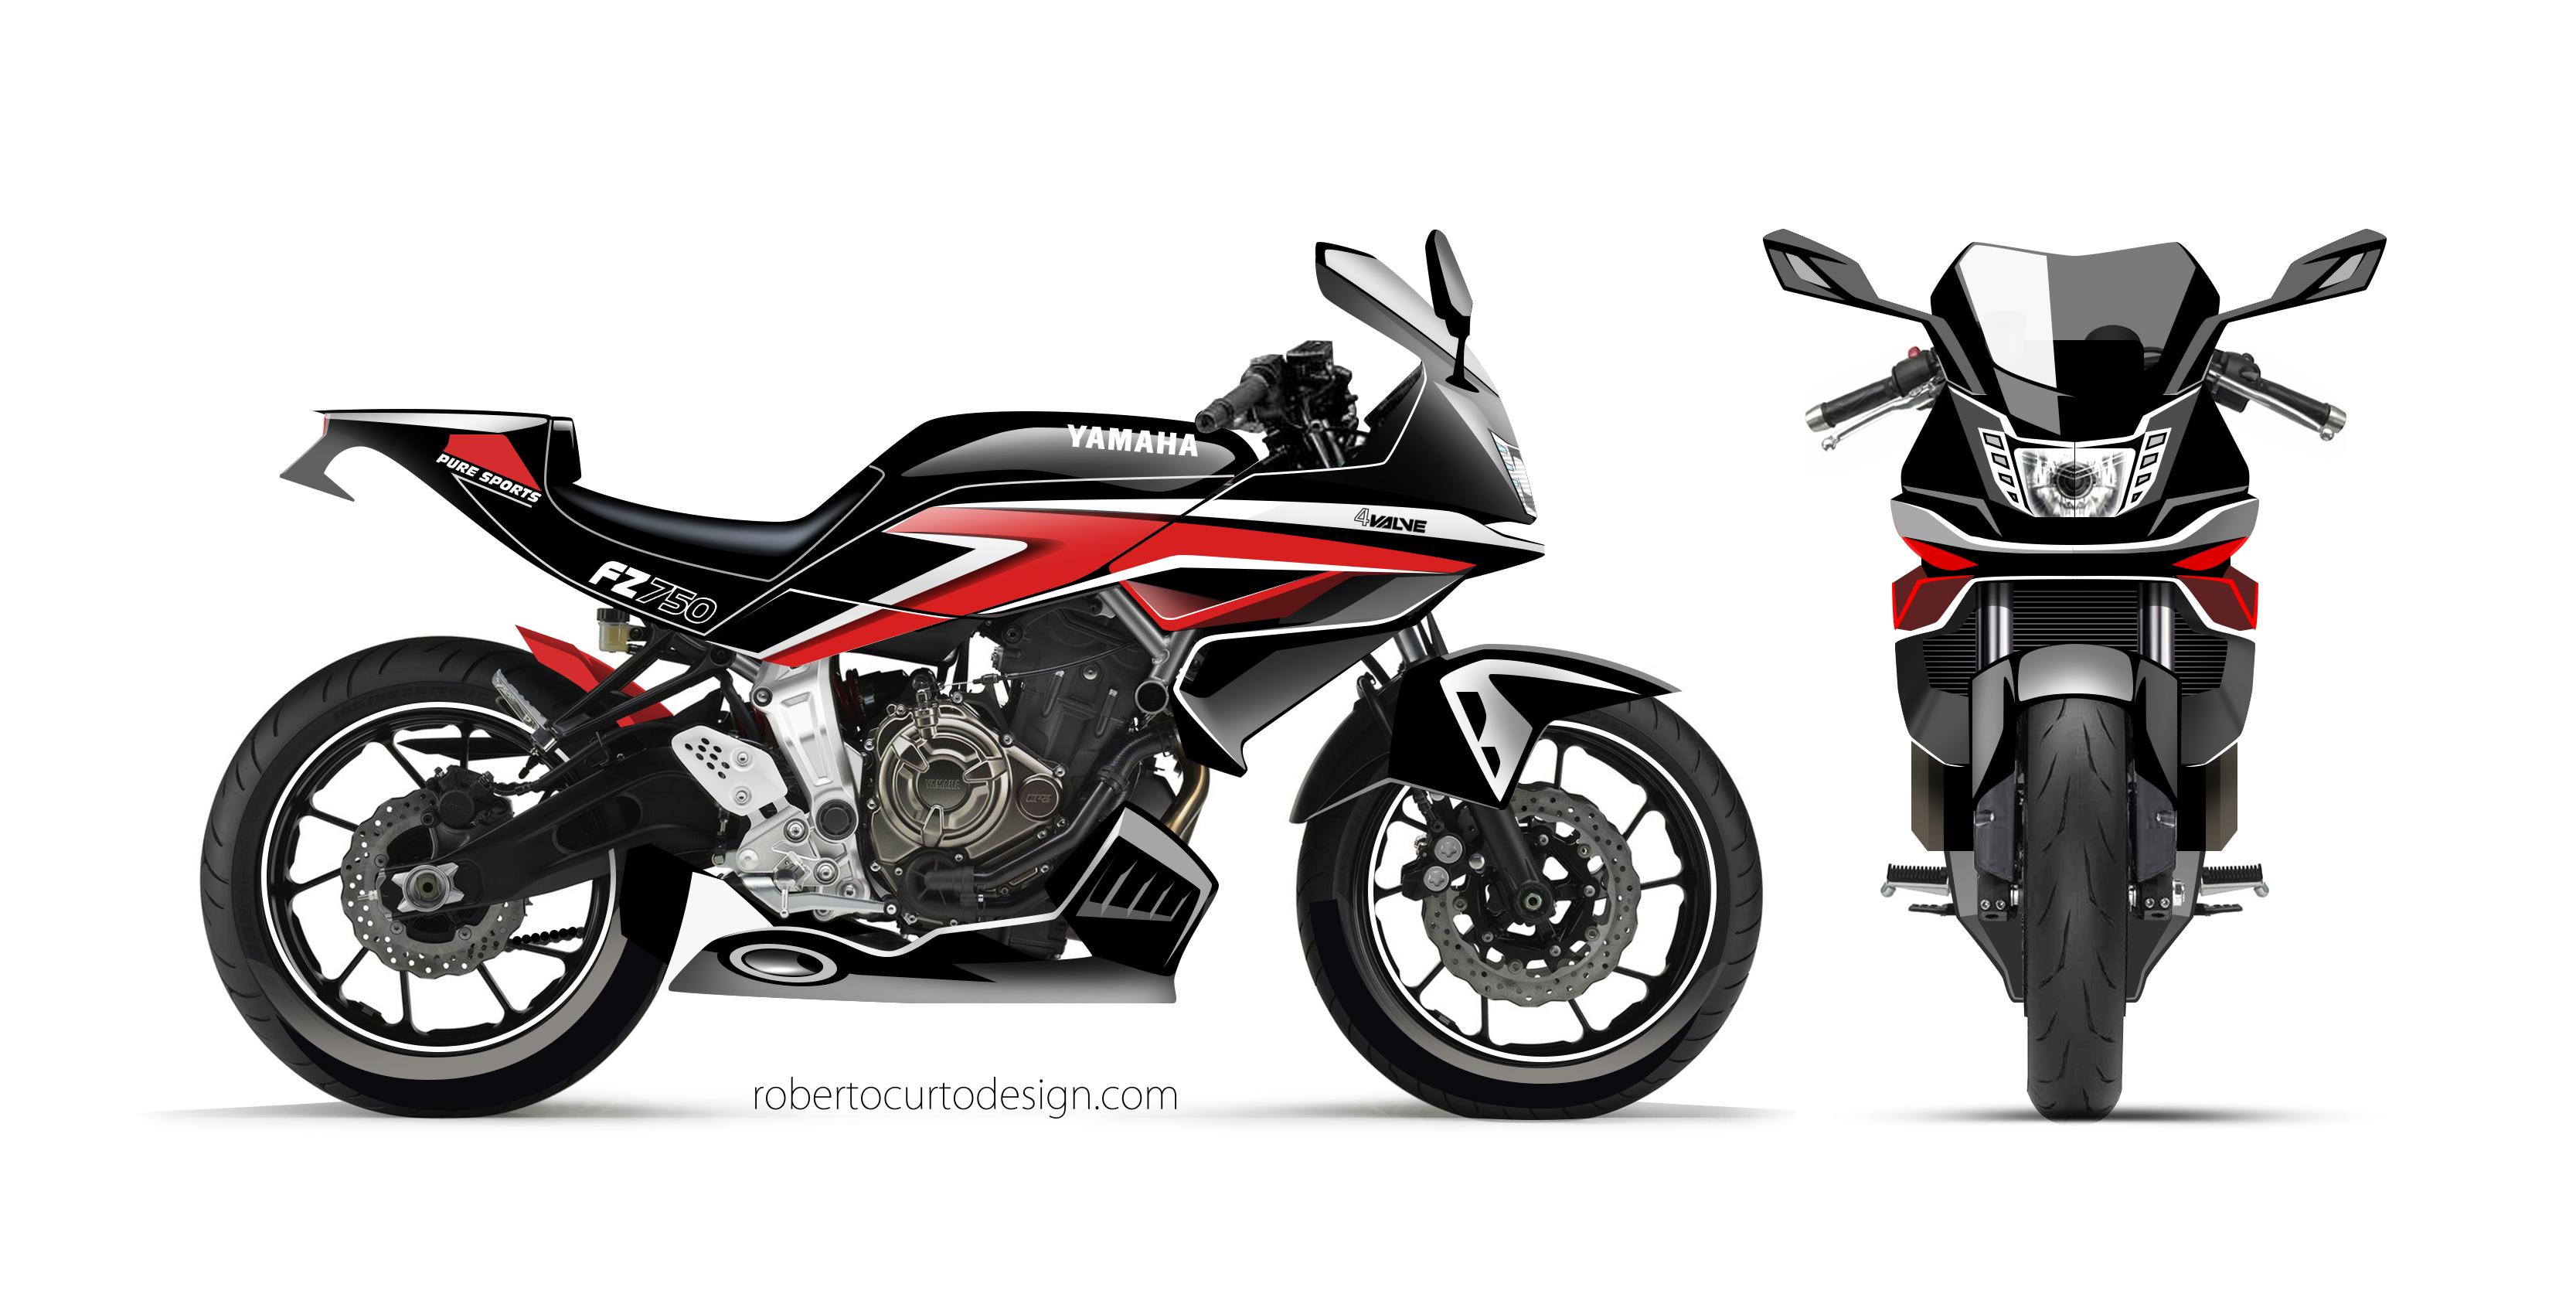 Yamaha FZ 750 concept 2017